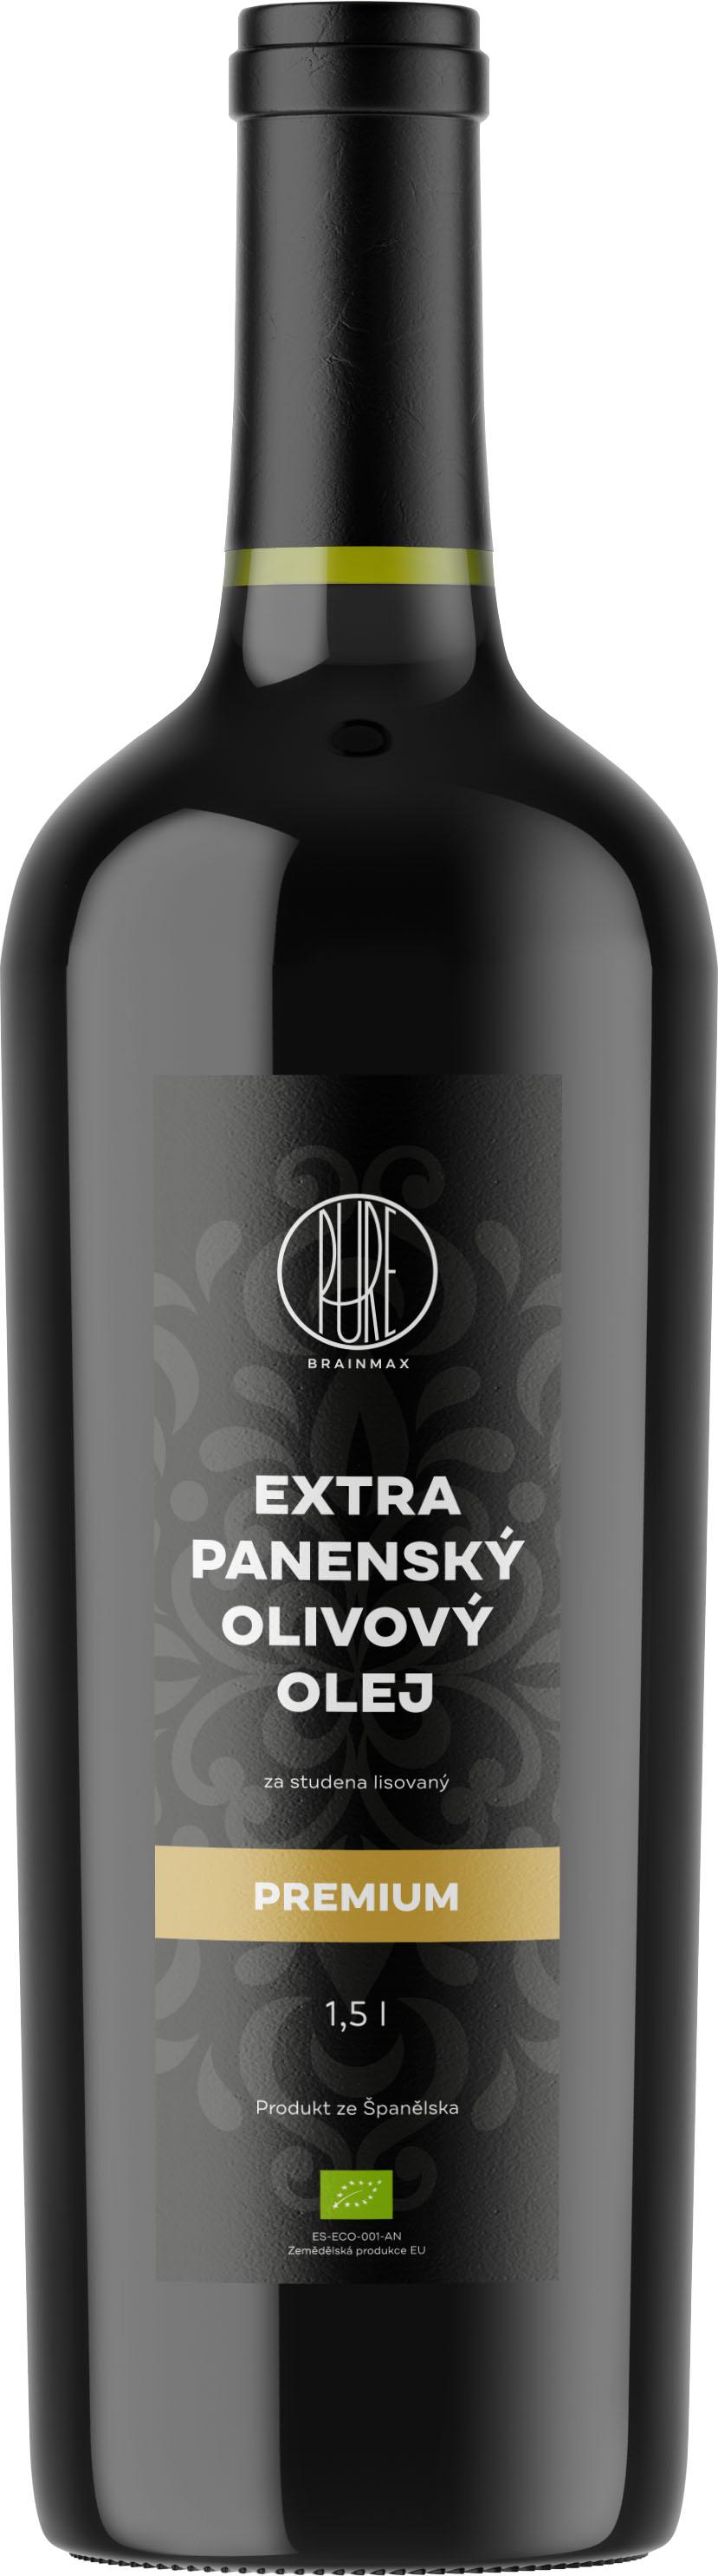 BrainMax Pure Olivový olej PREMIUM, BIO, 1500 ml * ES-ECO-001-AN certifikát